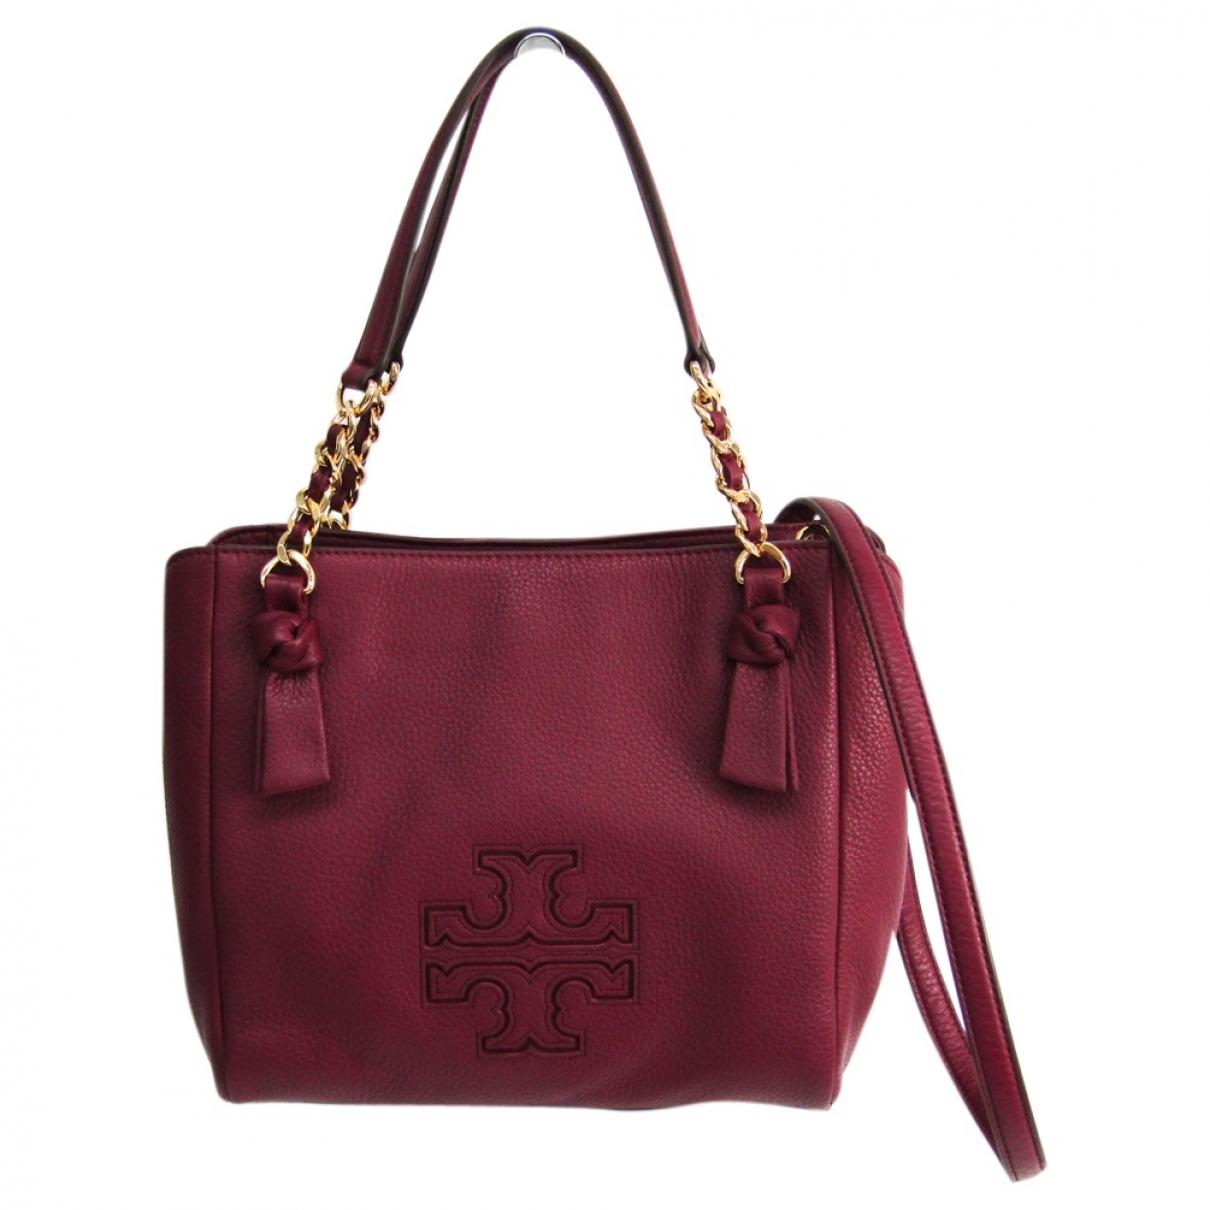 Tory Burch \N Burgundy Leather handbag for Women \N